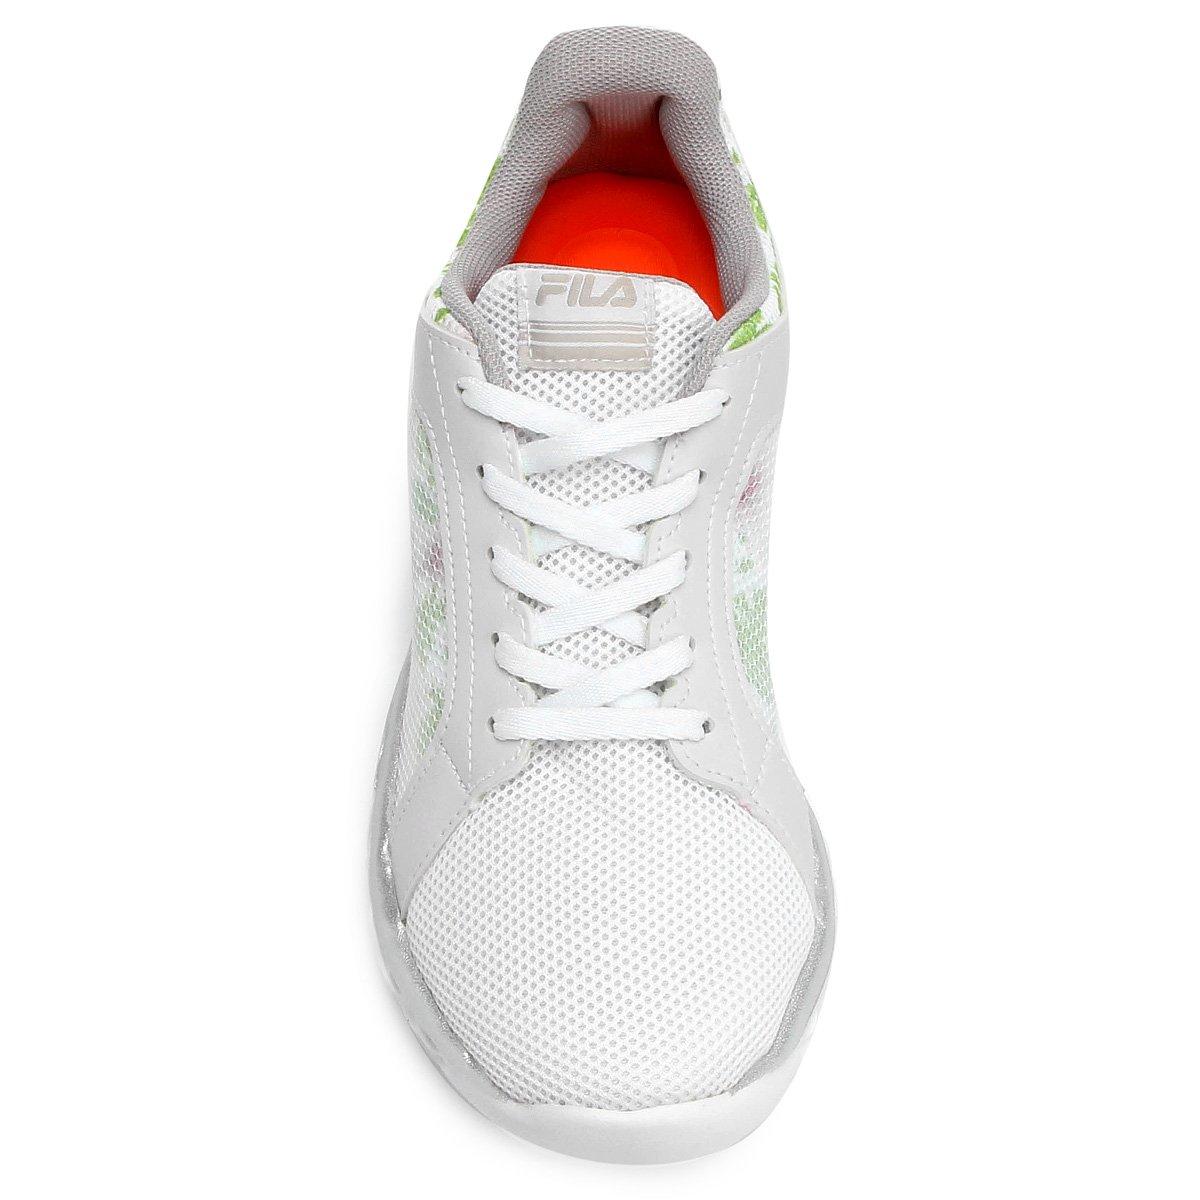 1752b616621 Feminino Comfort 2 Lightstep Branco 0 Tênis prata Fila e qSEZX for ...